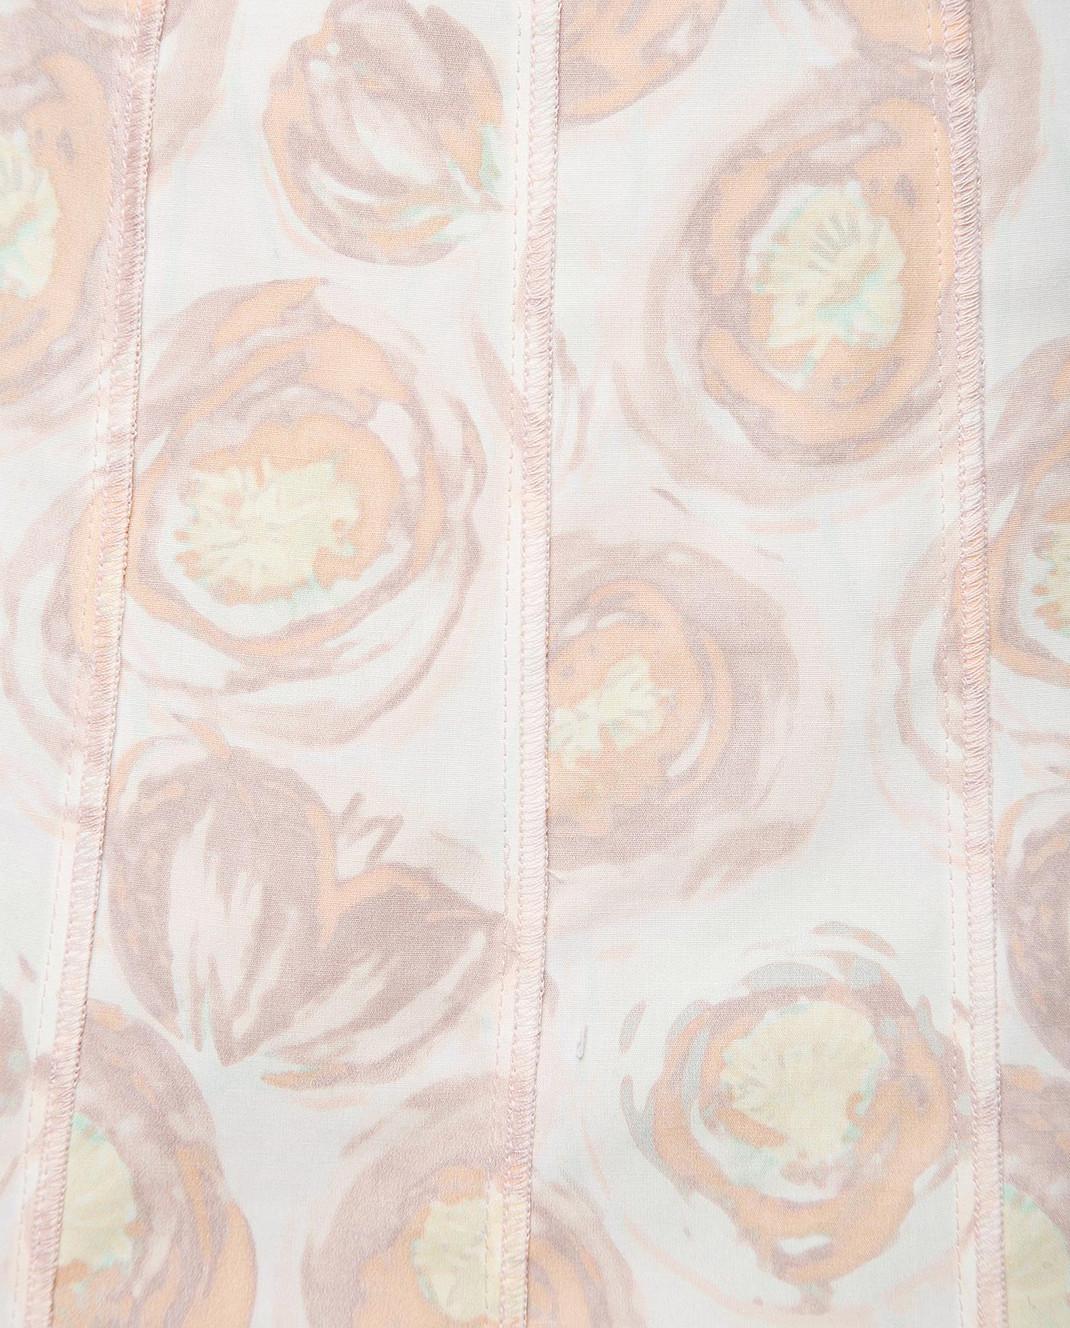 Marc Jacobs Светло-бежевая юбка M4007208 изображение 5